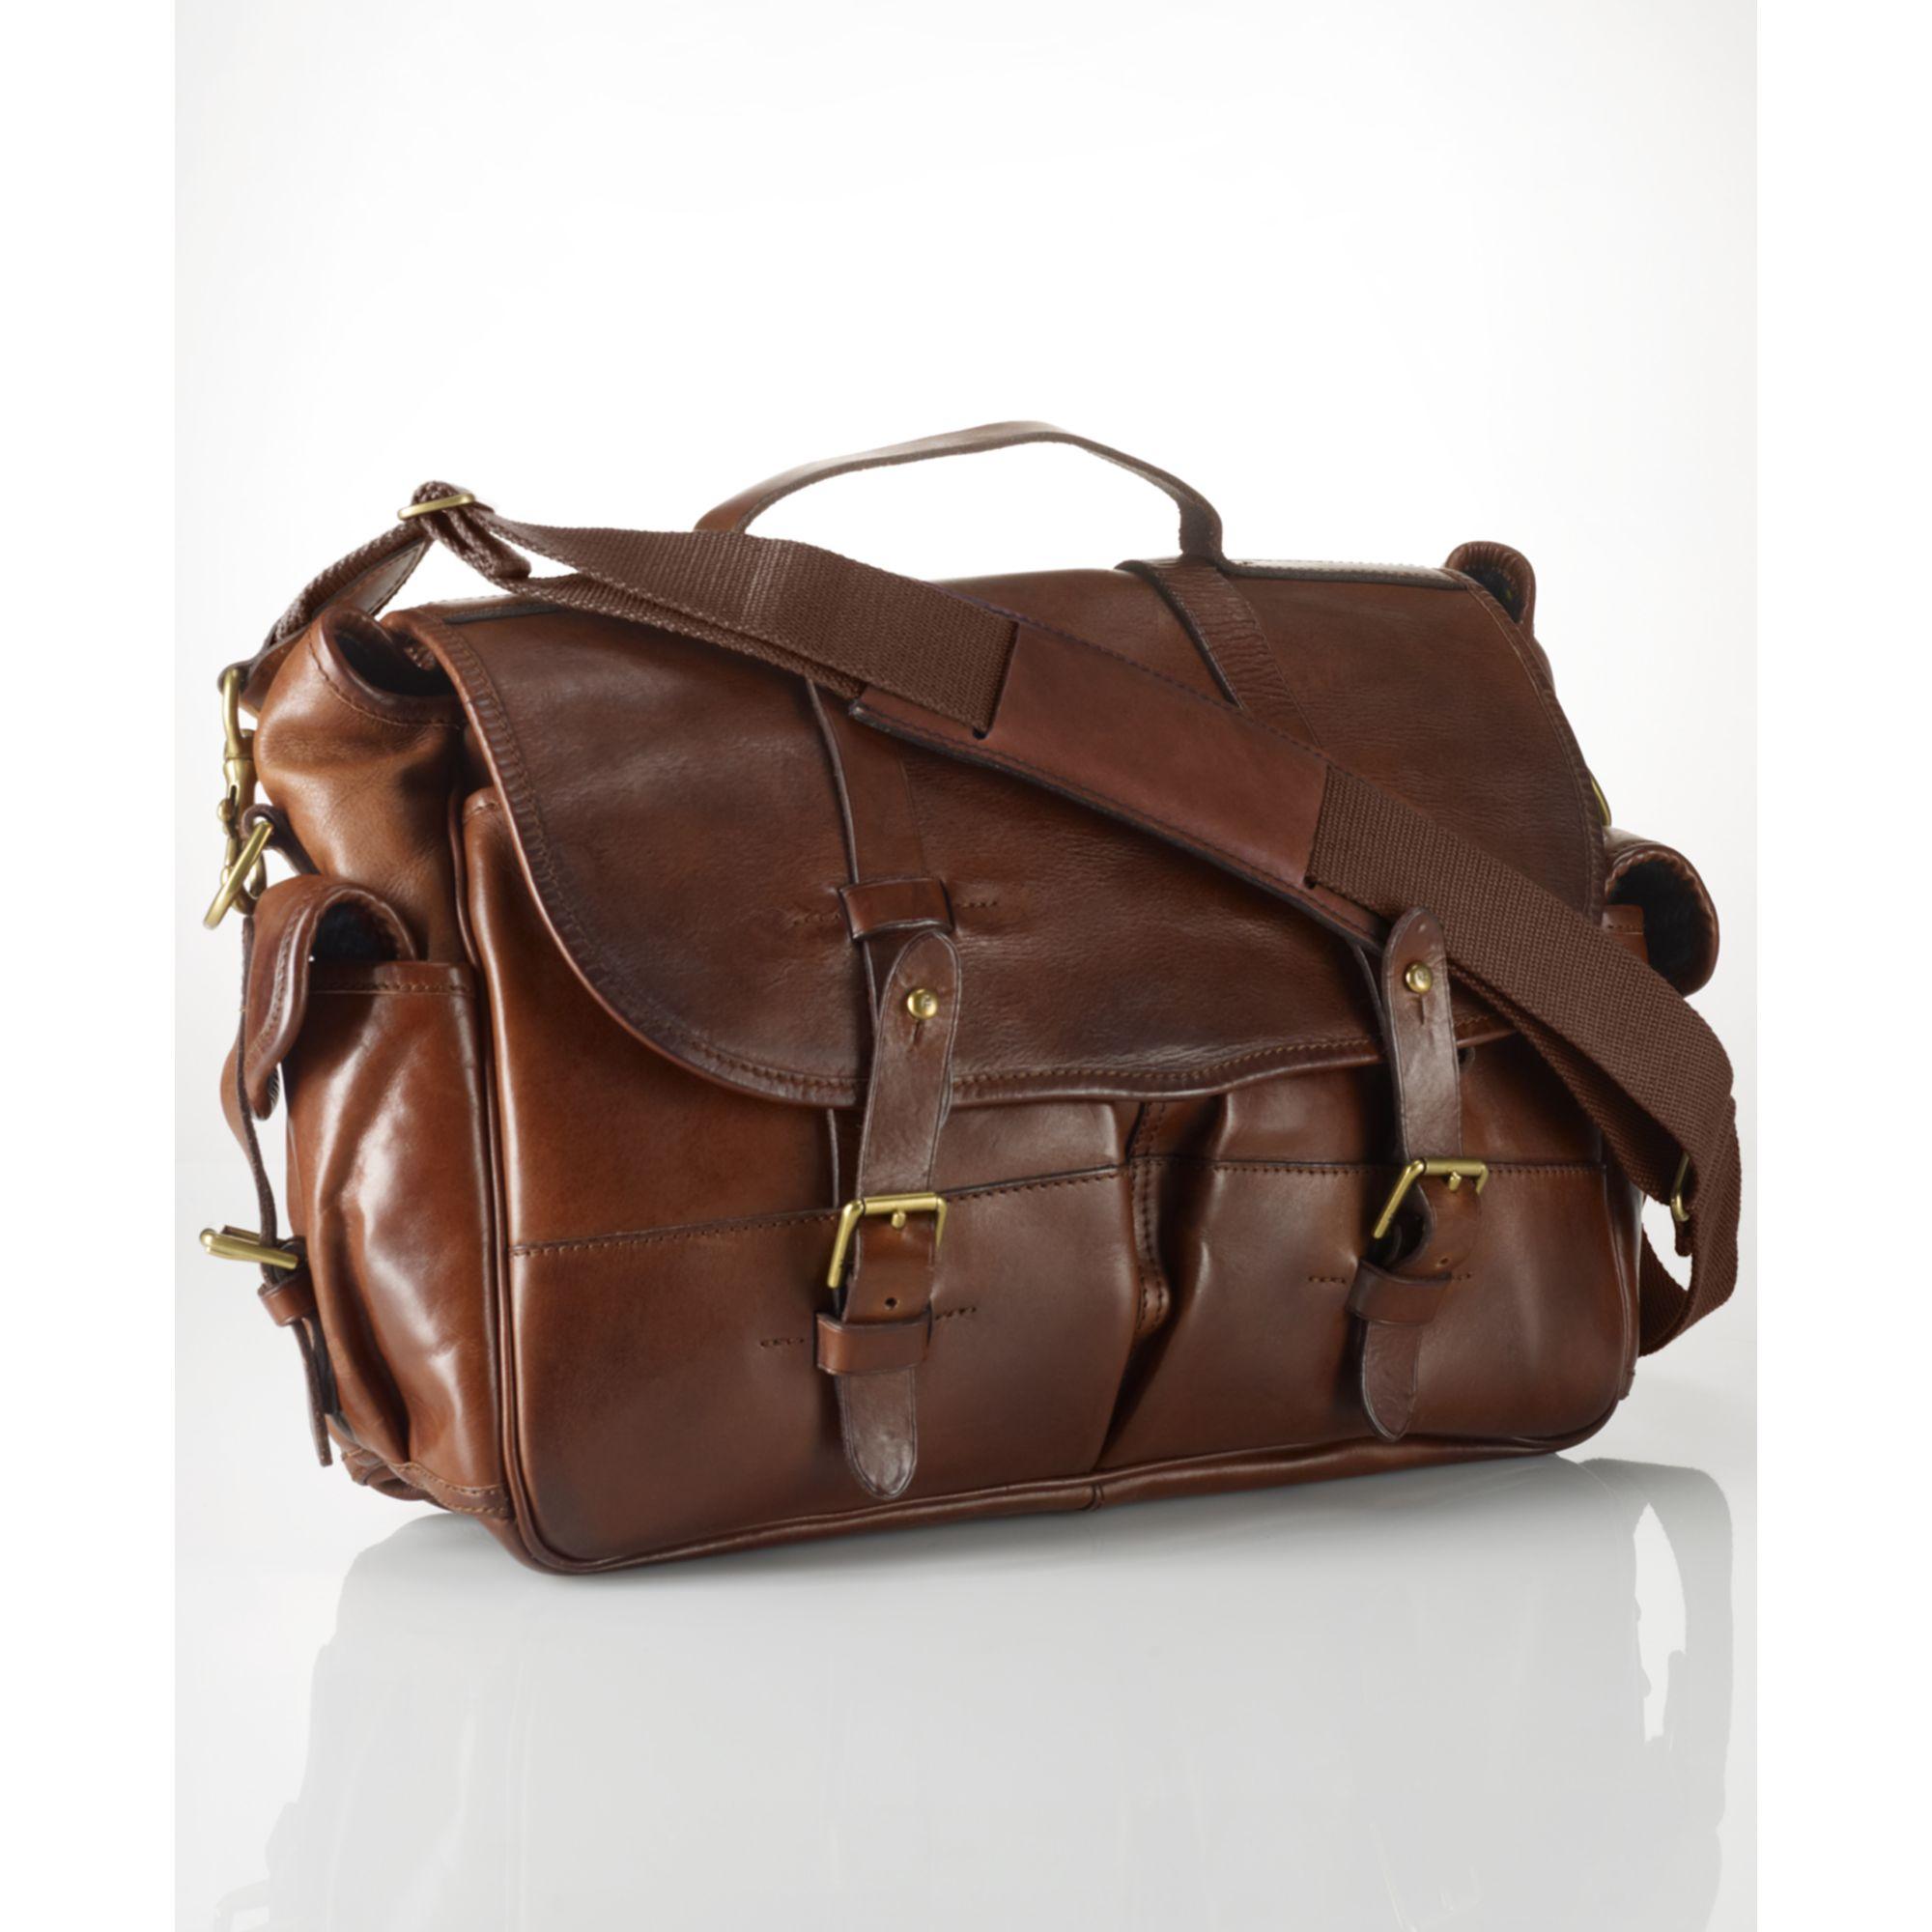 Ralph Lauren Leather Messenger Bag In Brown For Men Lyst